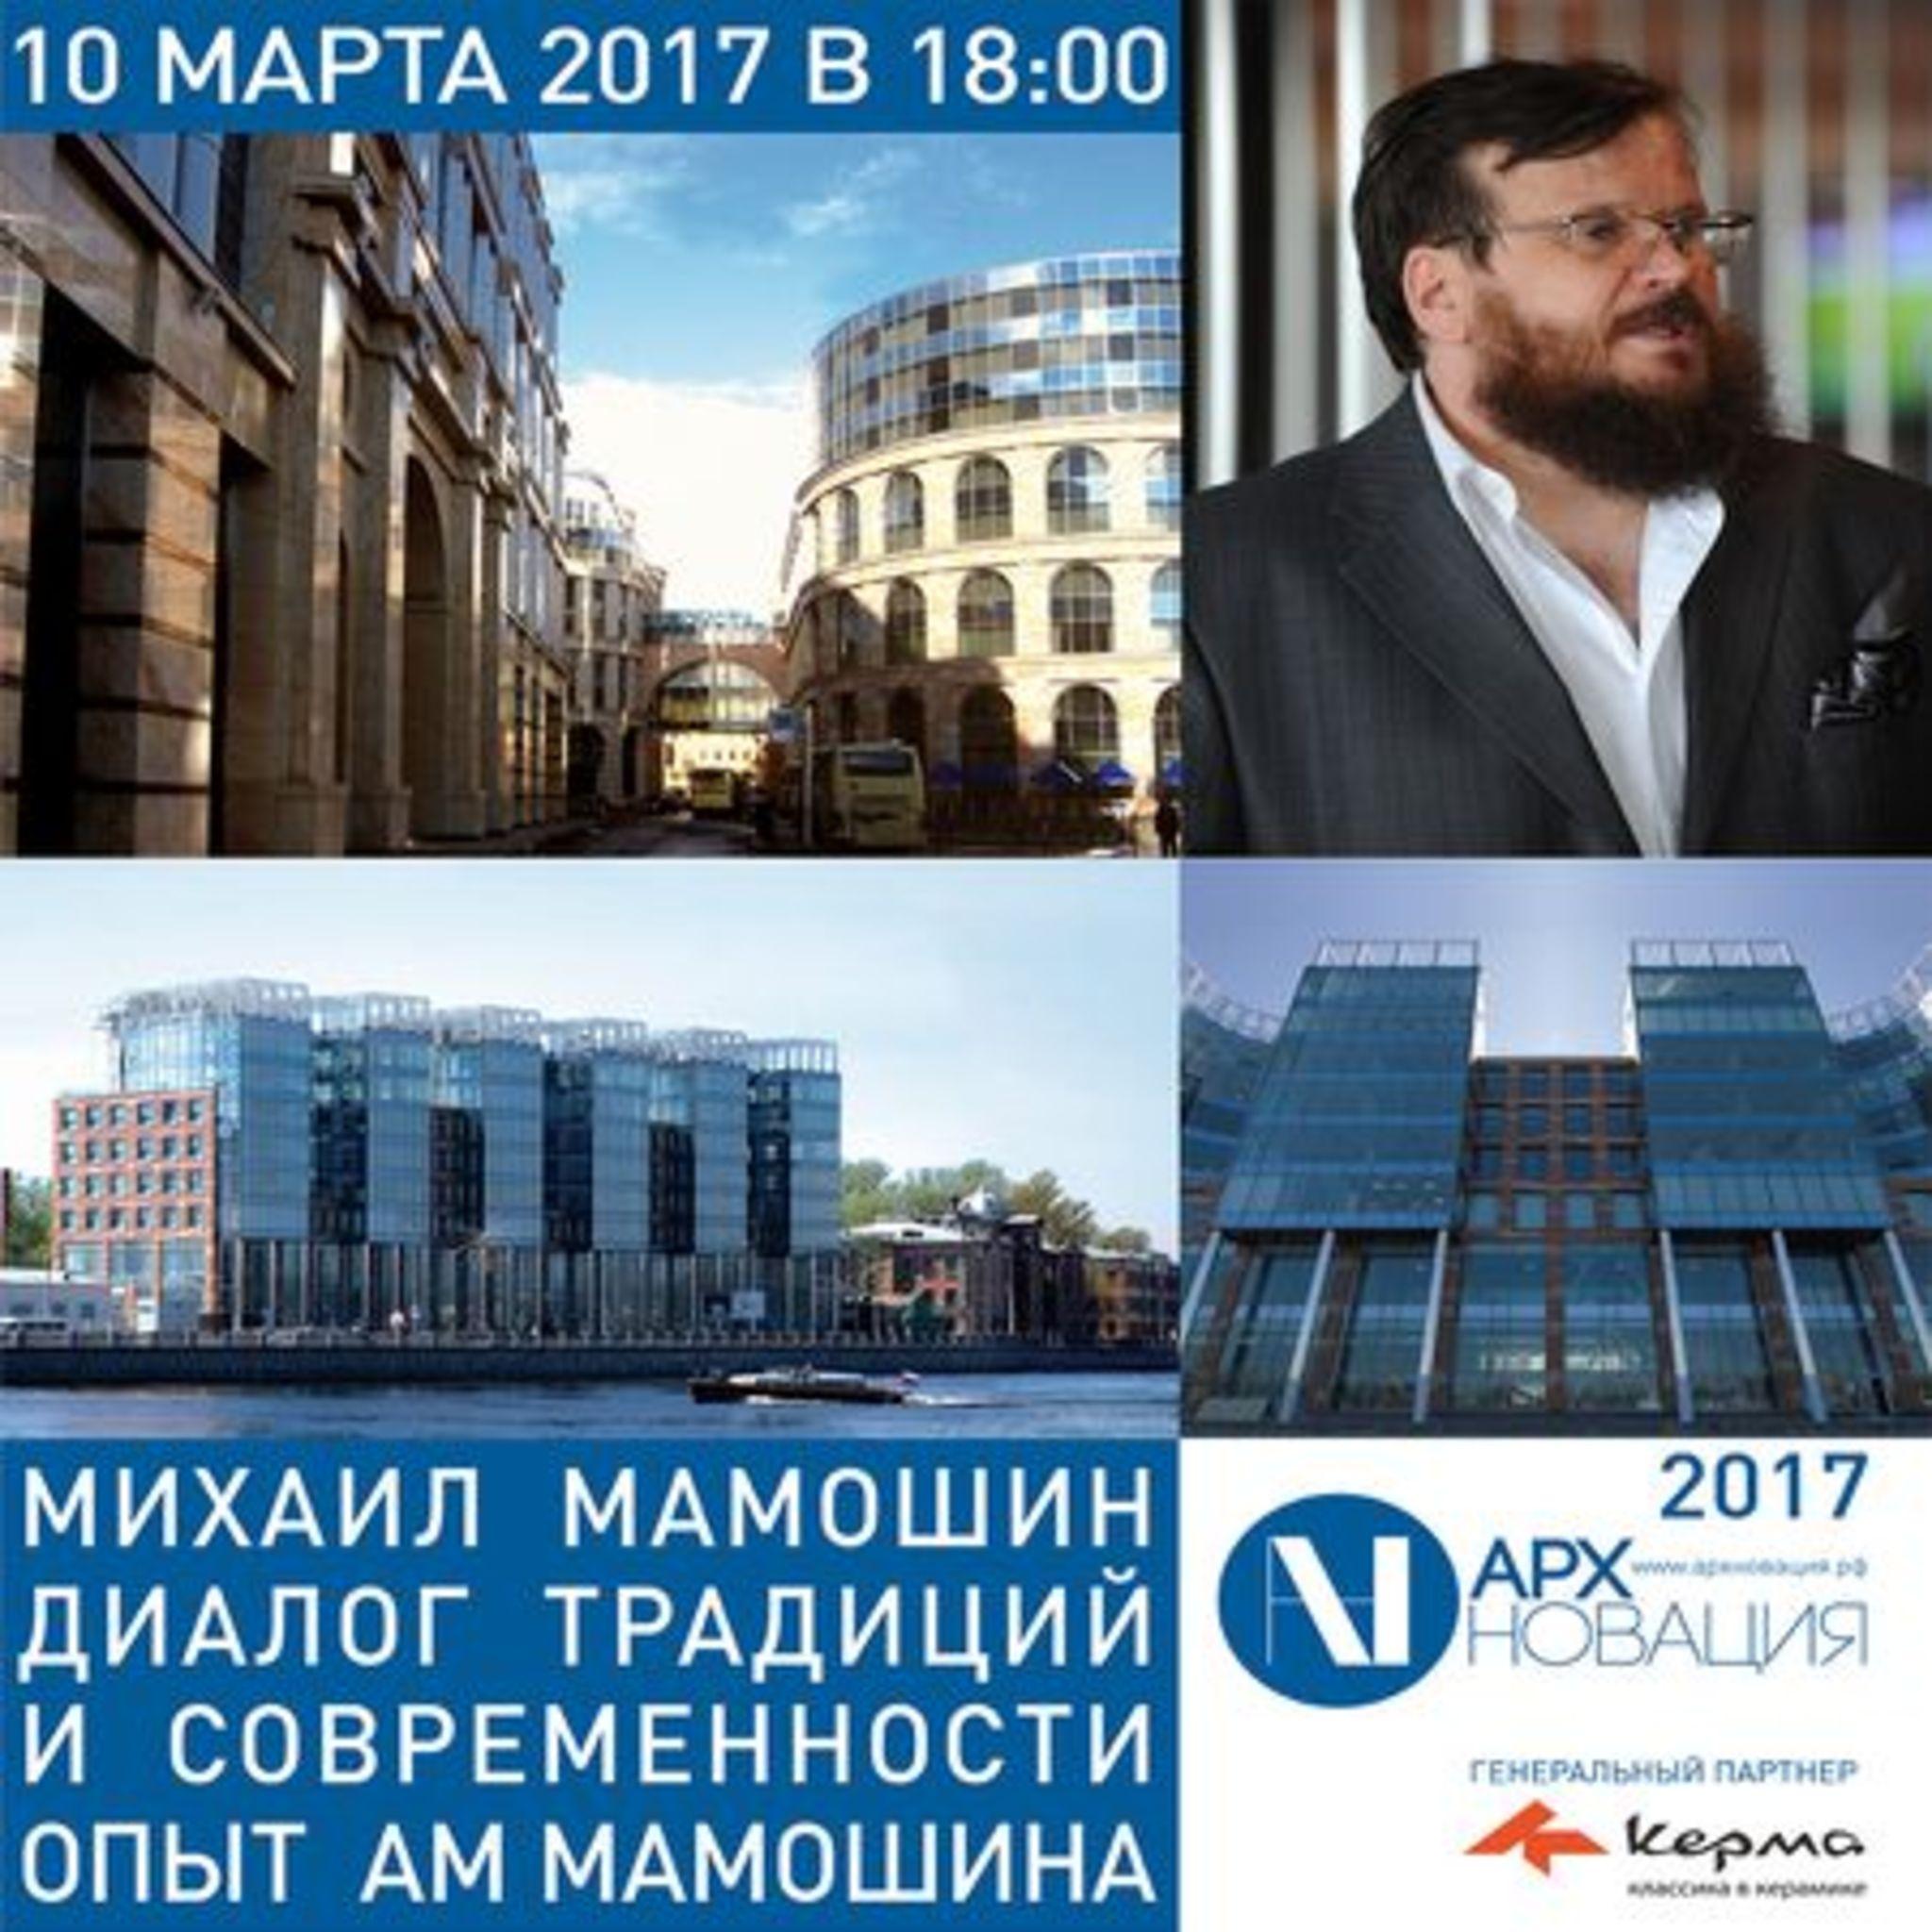 Мастер-класс архитектора Михаила Мамошина